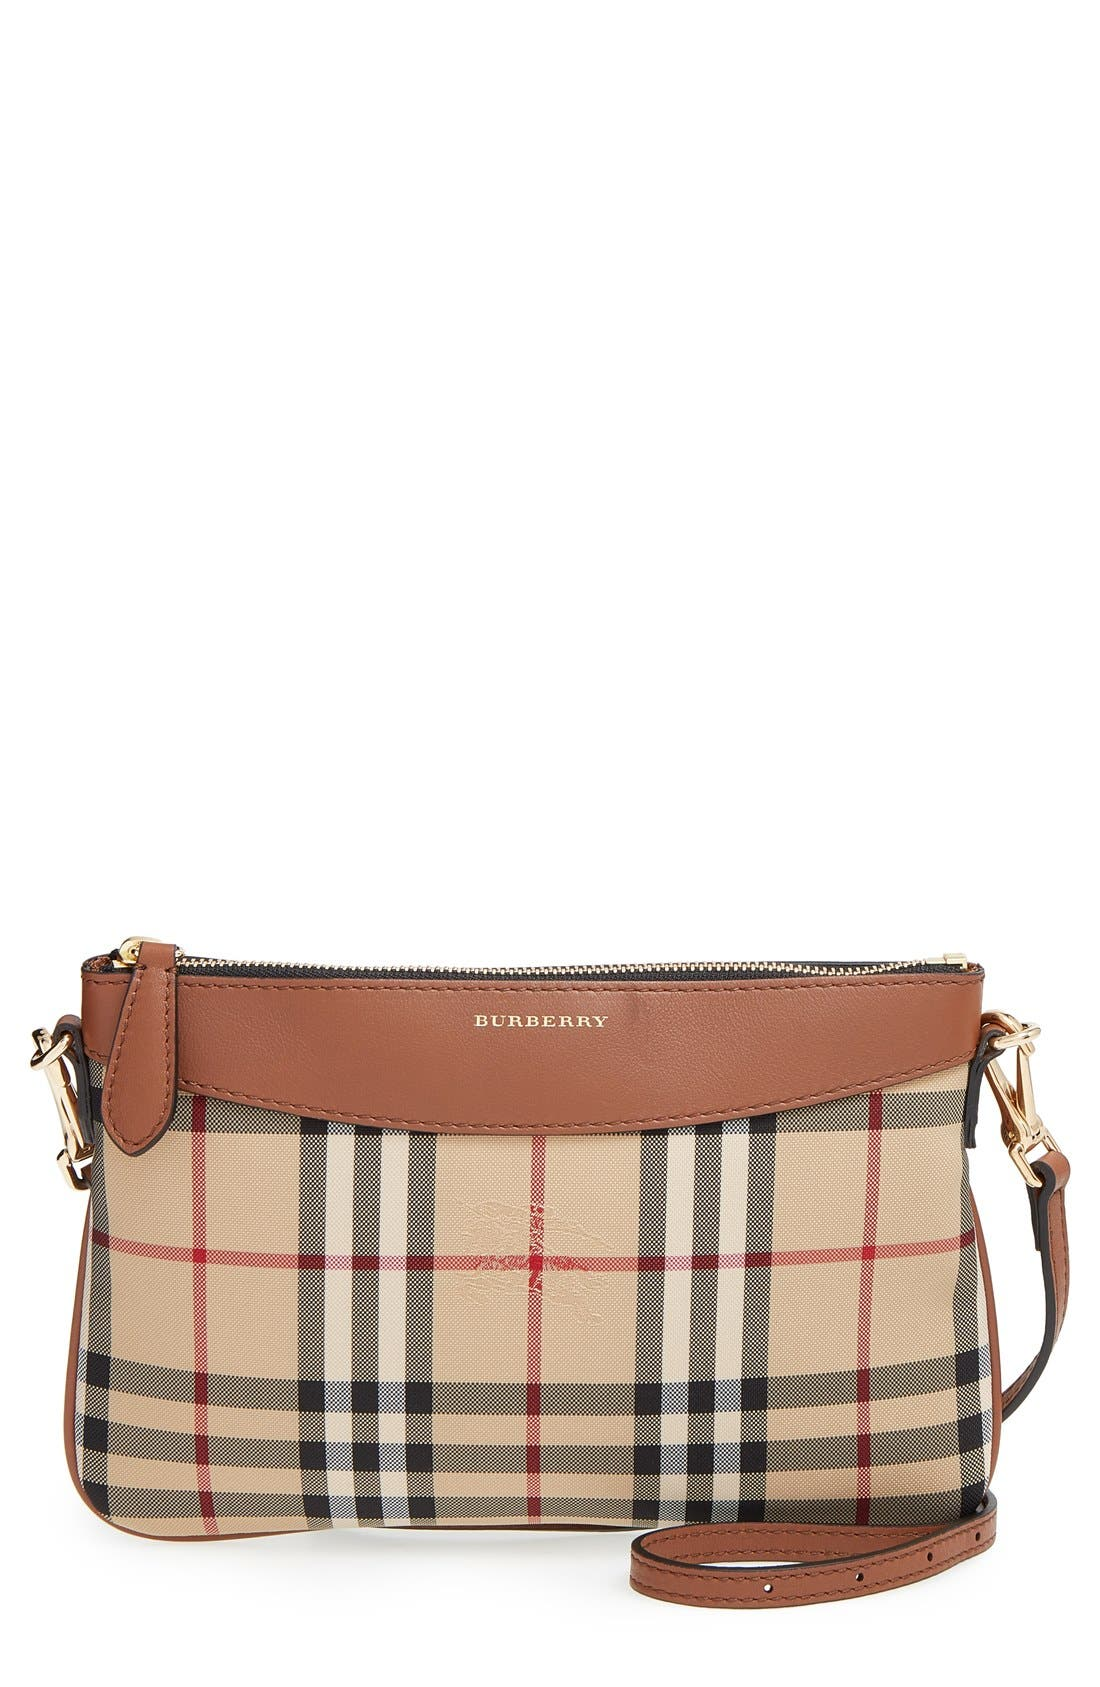 Main Image - Burberry 'Peyton - Horseferry Check' Crossbody Bag